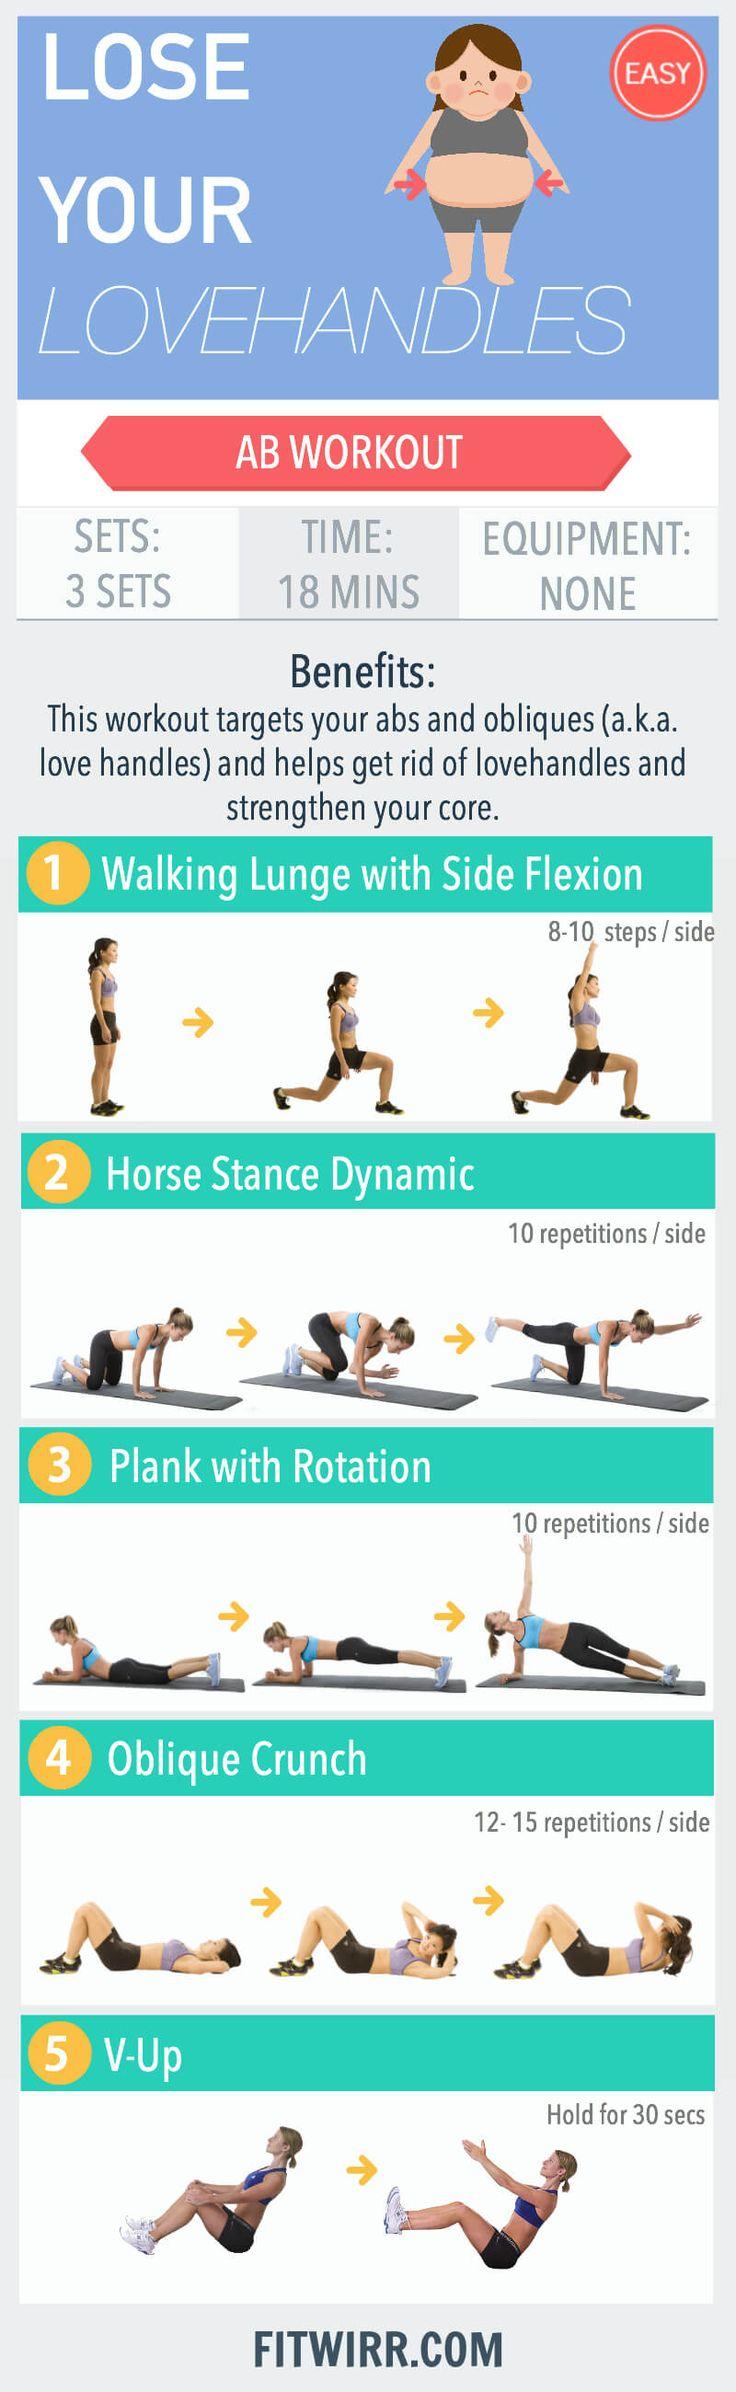 Love Handles Workout Routine #handles #workout #abs #exercise #health #gym #athome #pneuzinho #treino #abdominal #exercício #saúde #academia #emcasa